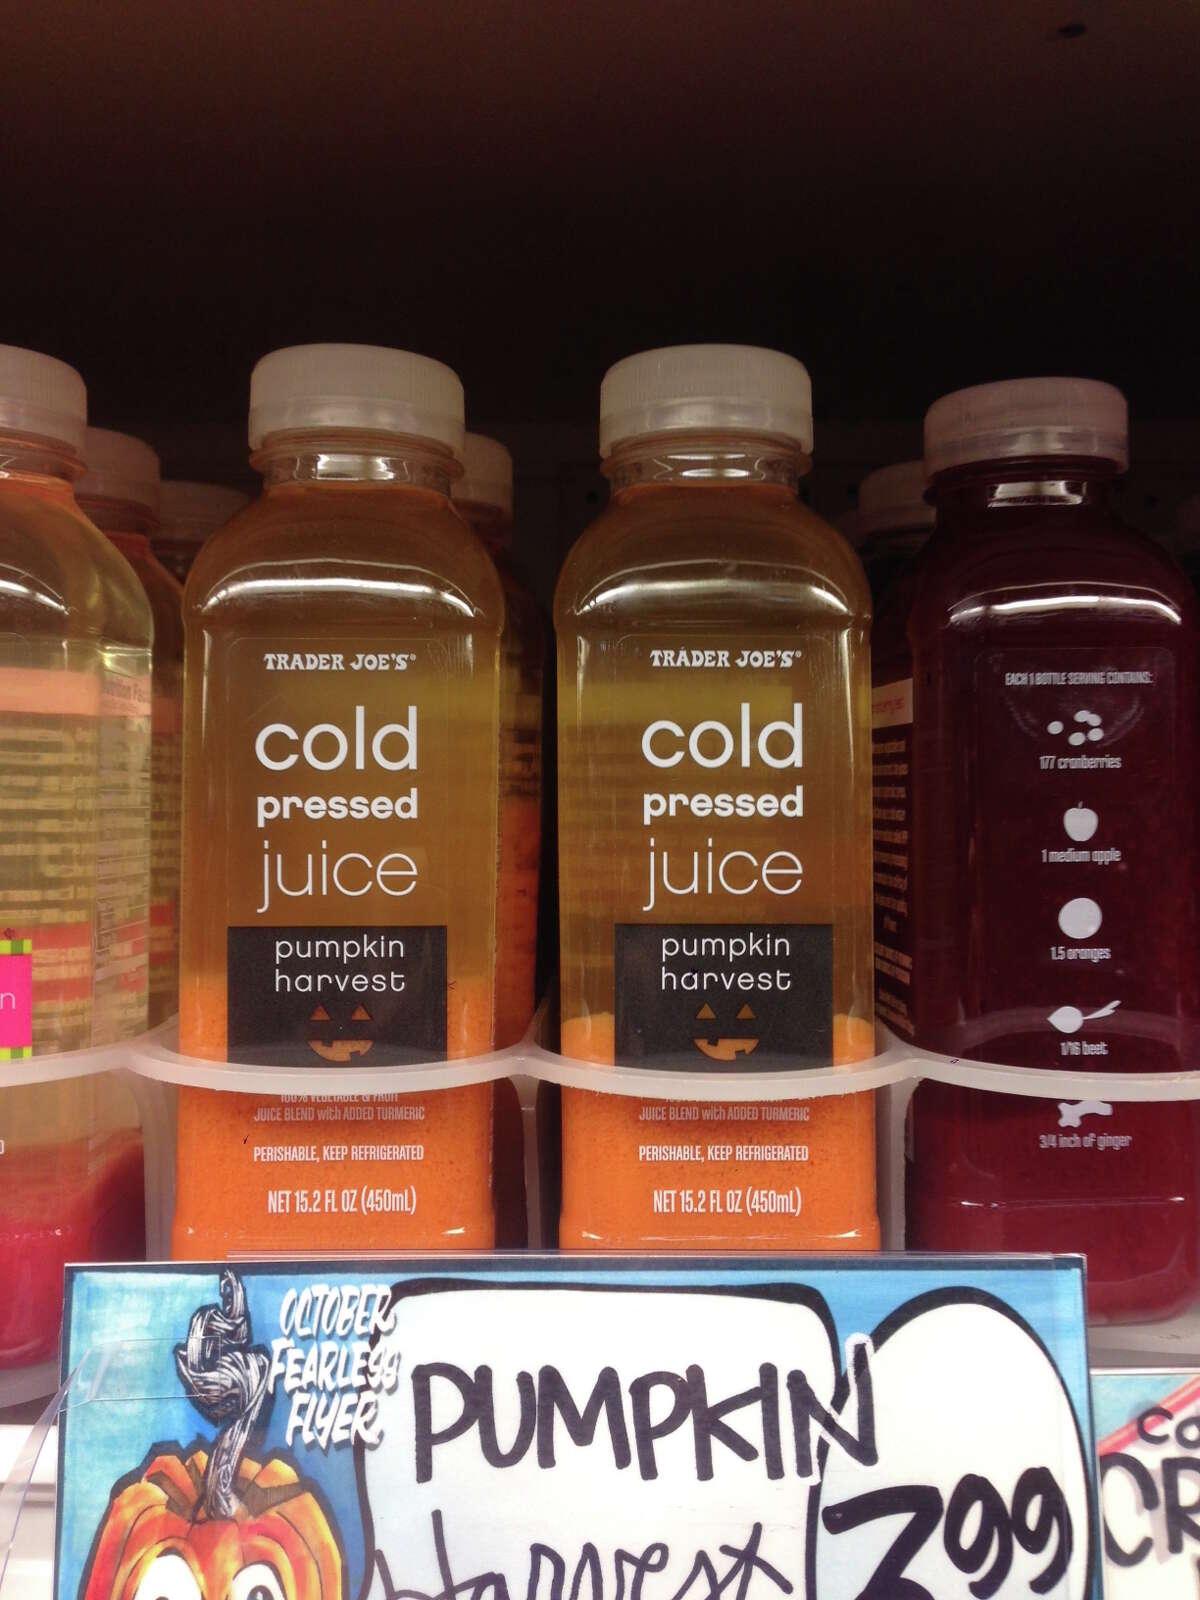 2) Trader Joe's Cold Pressed Pumpkin Harvest Juice: Carrots, celery, sweet potatoes ginger, turmeric and, of course, pumpkin.